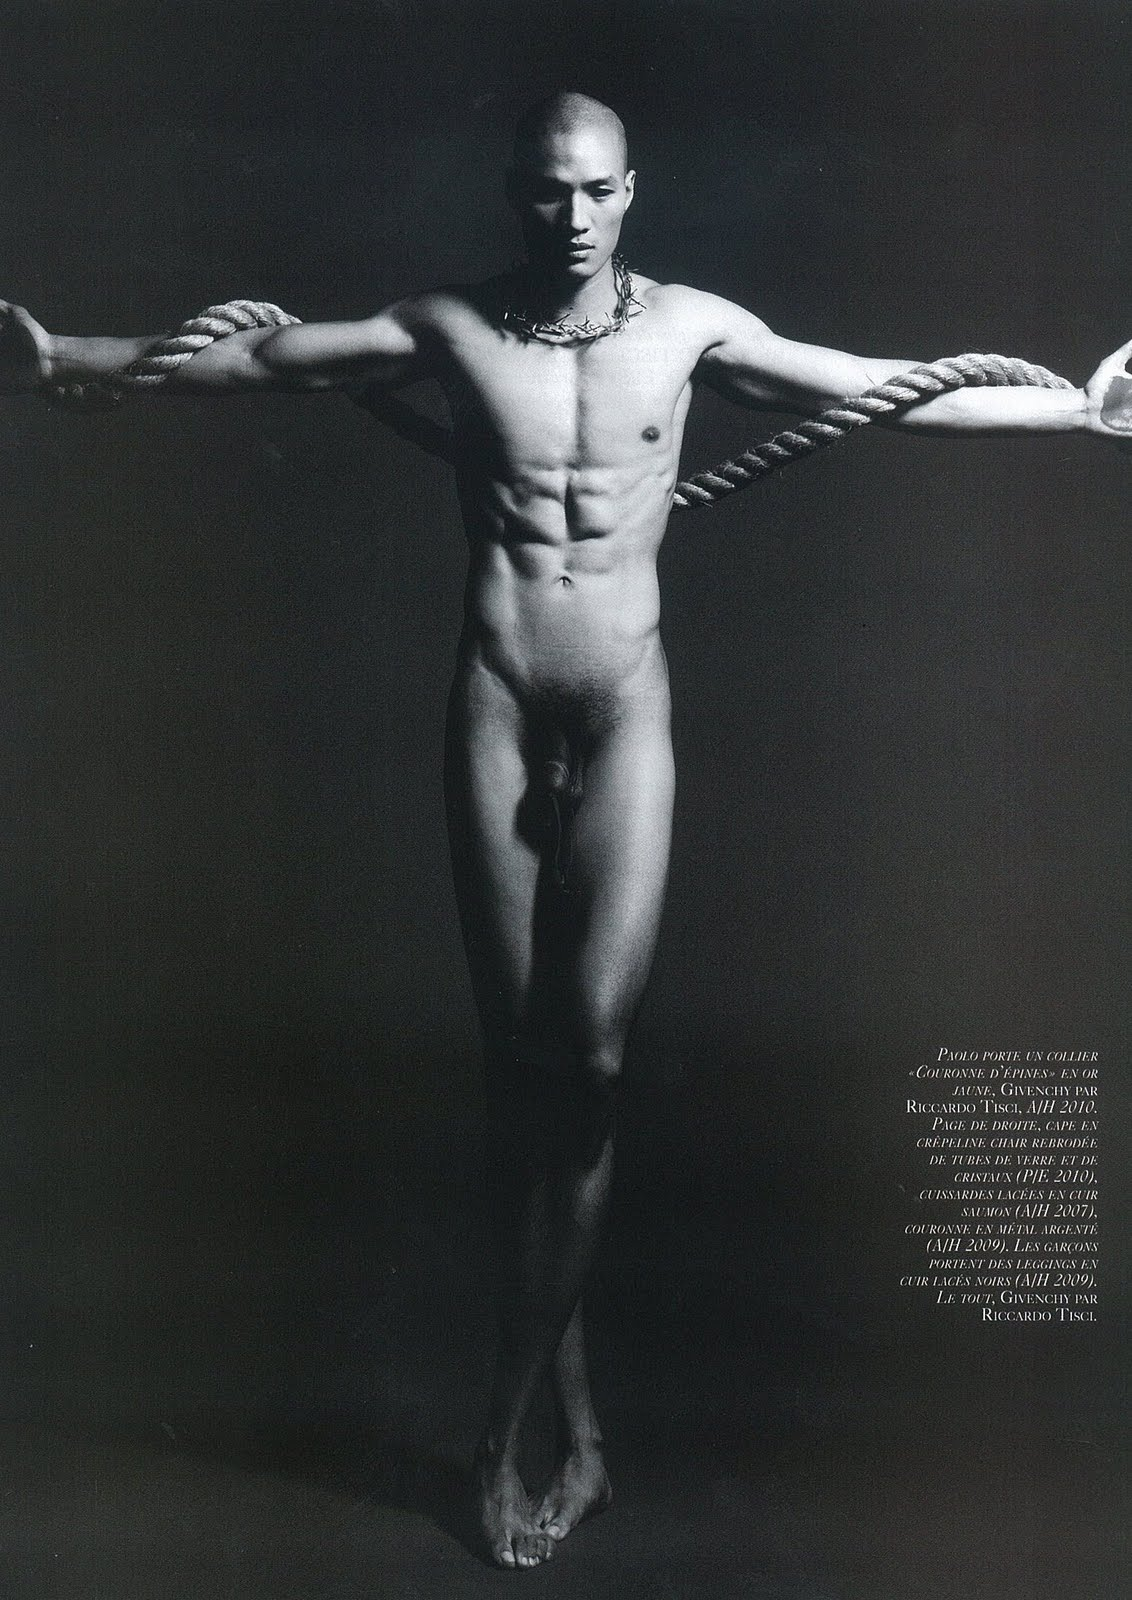 Nude straight filipino males gay guy